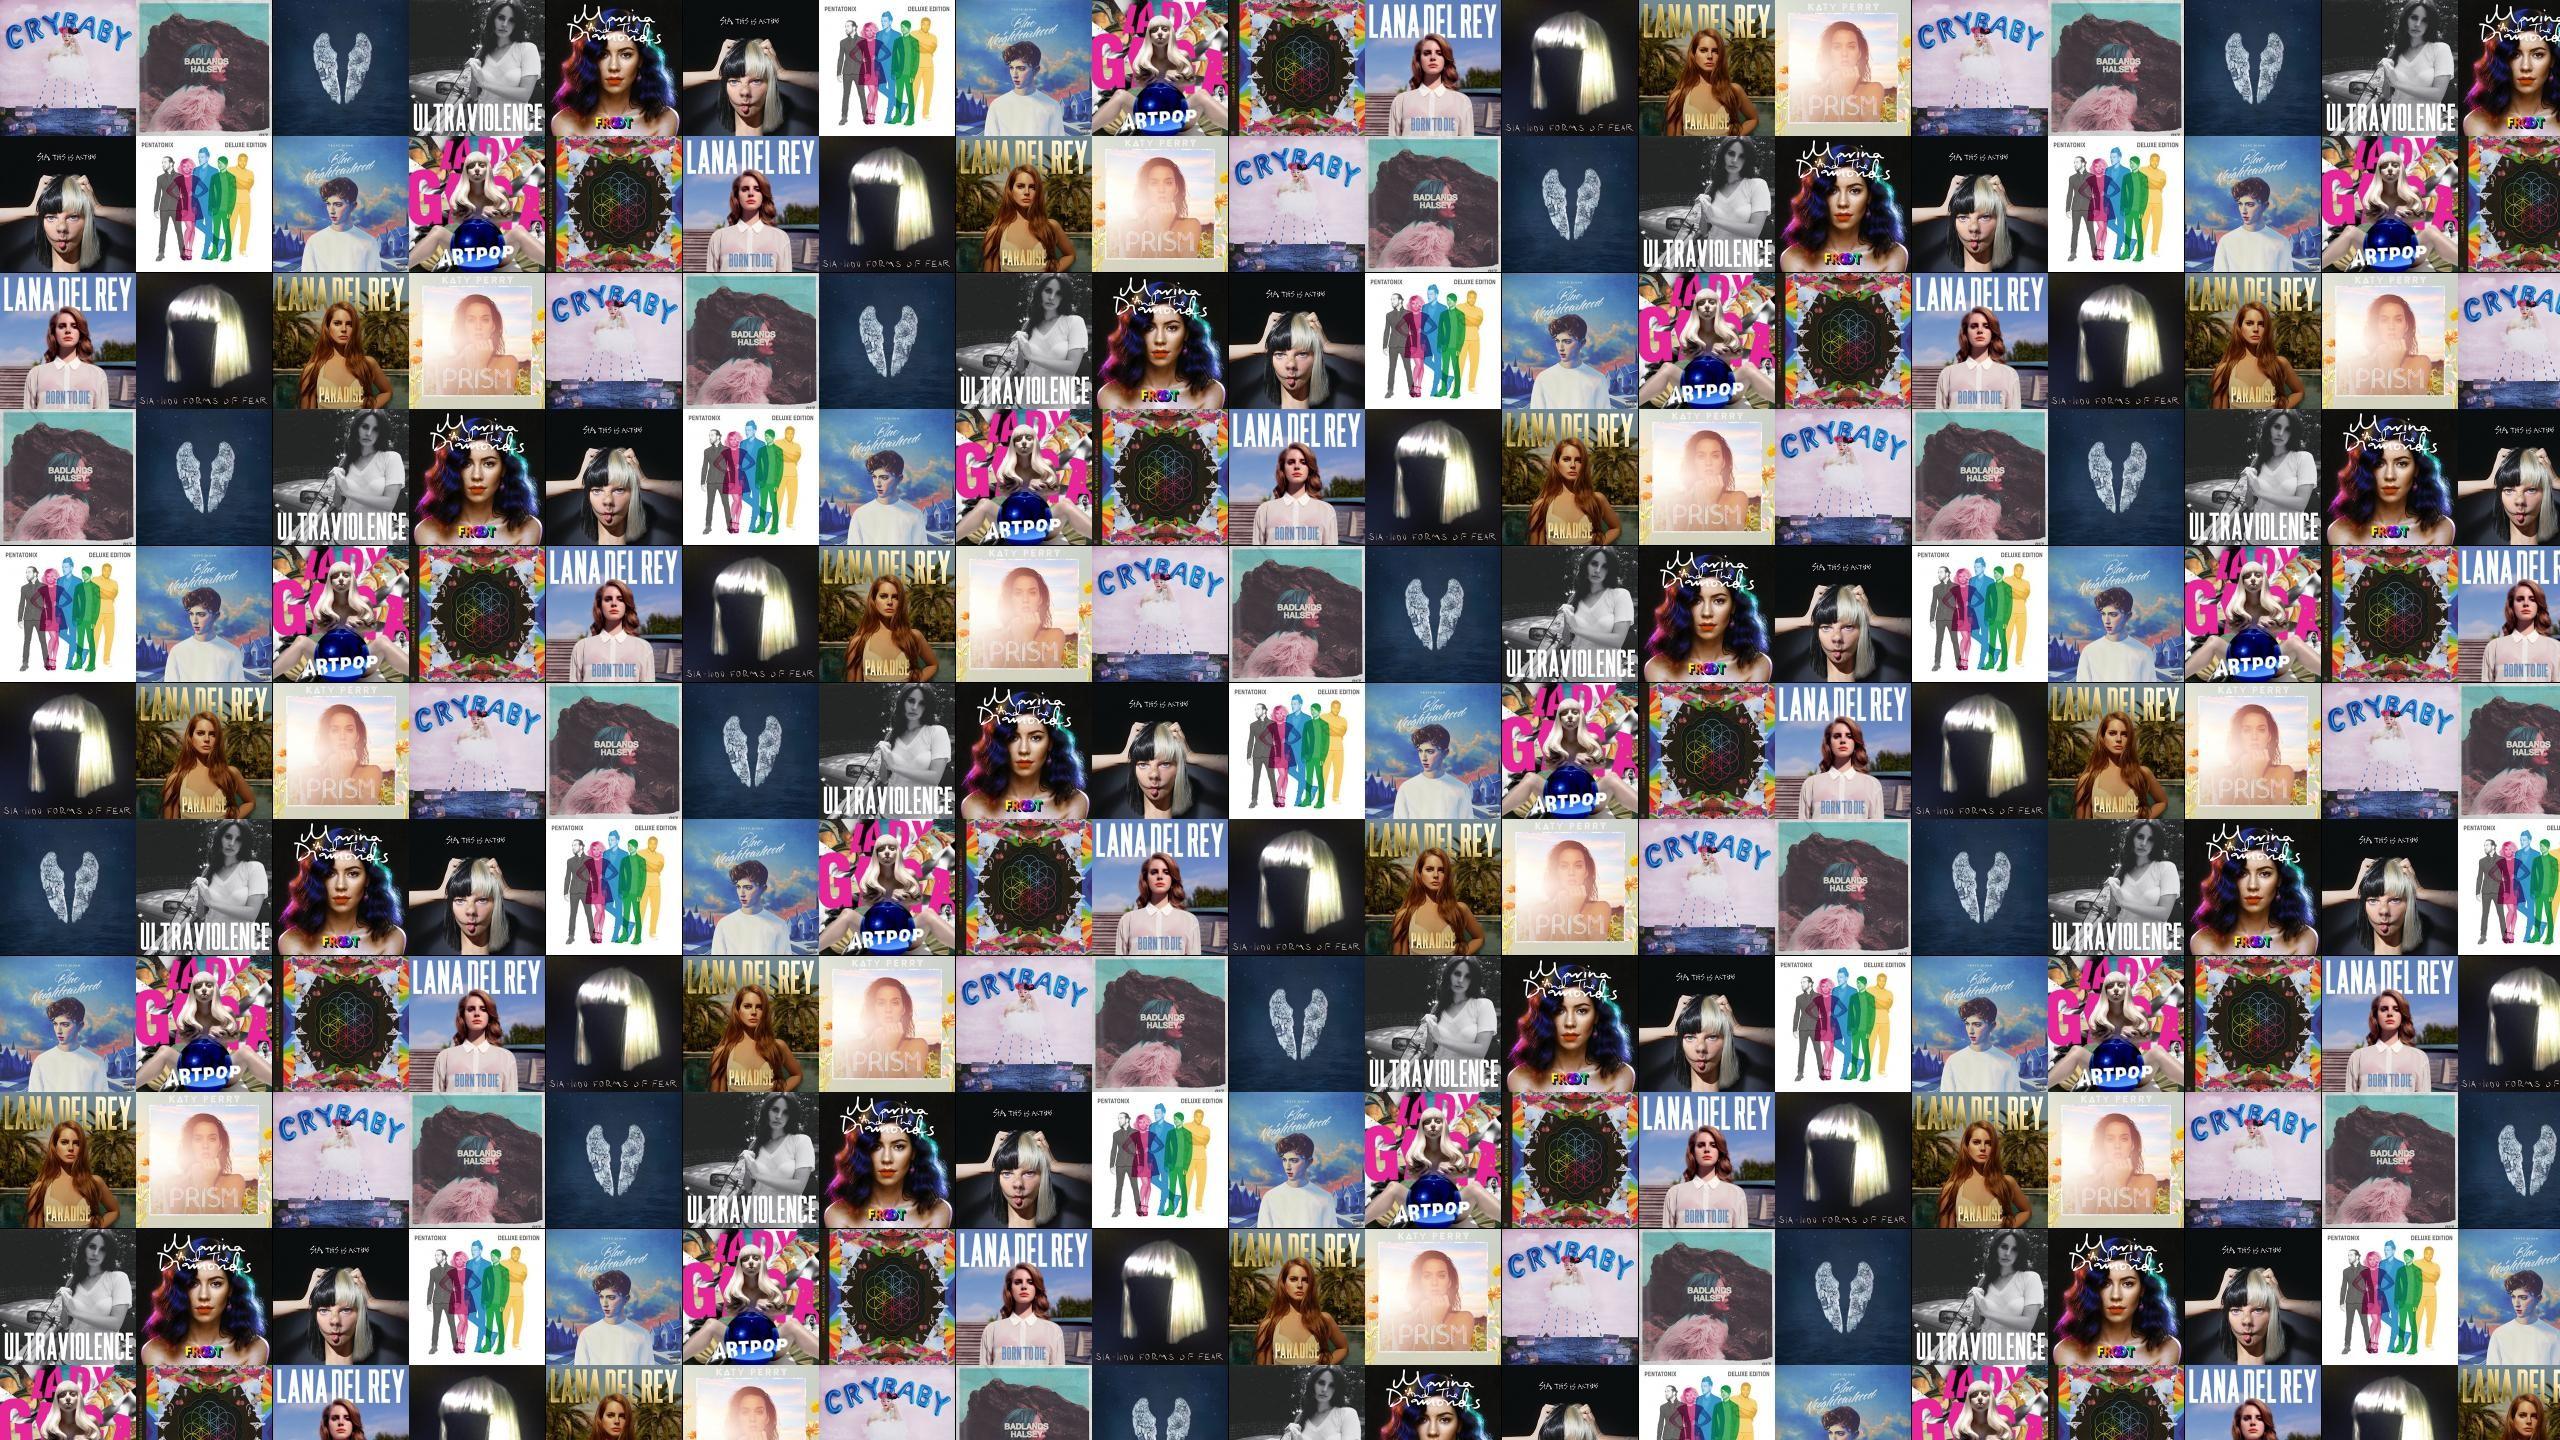 Melanie Martinez Cry Baby Halsey Badlands Coldplay Wallpaper